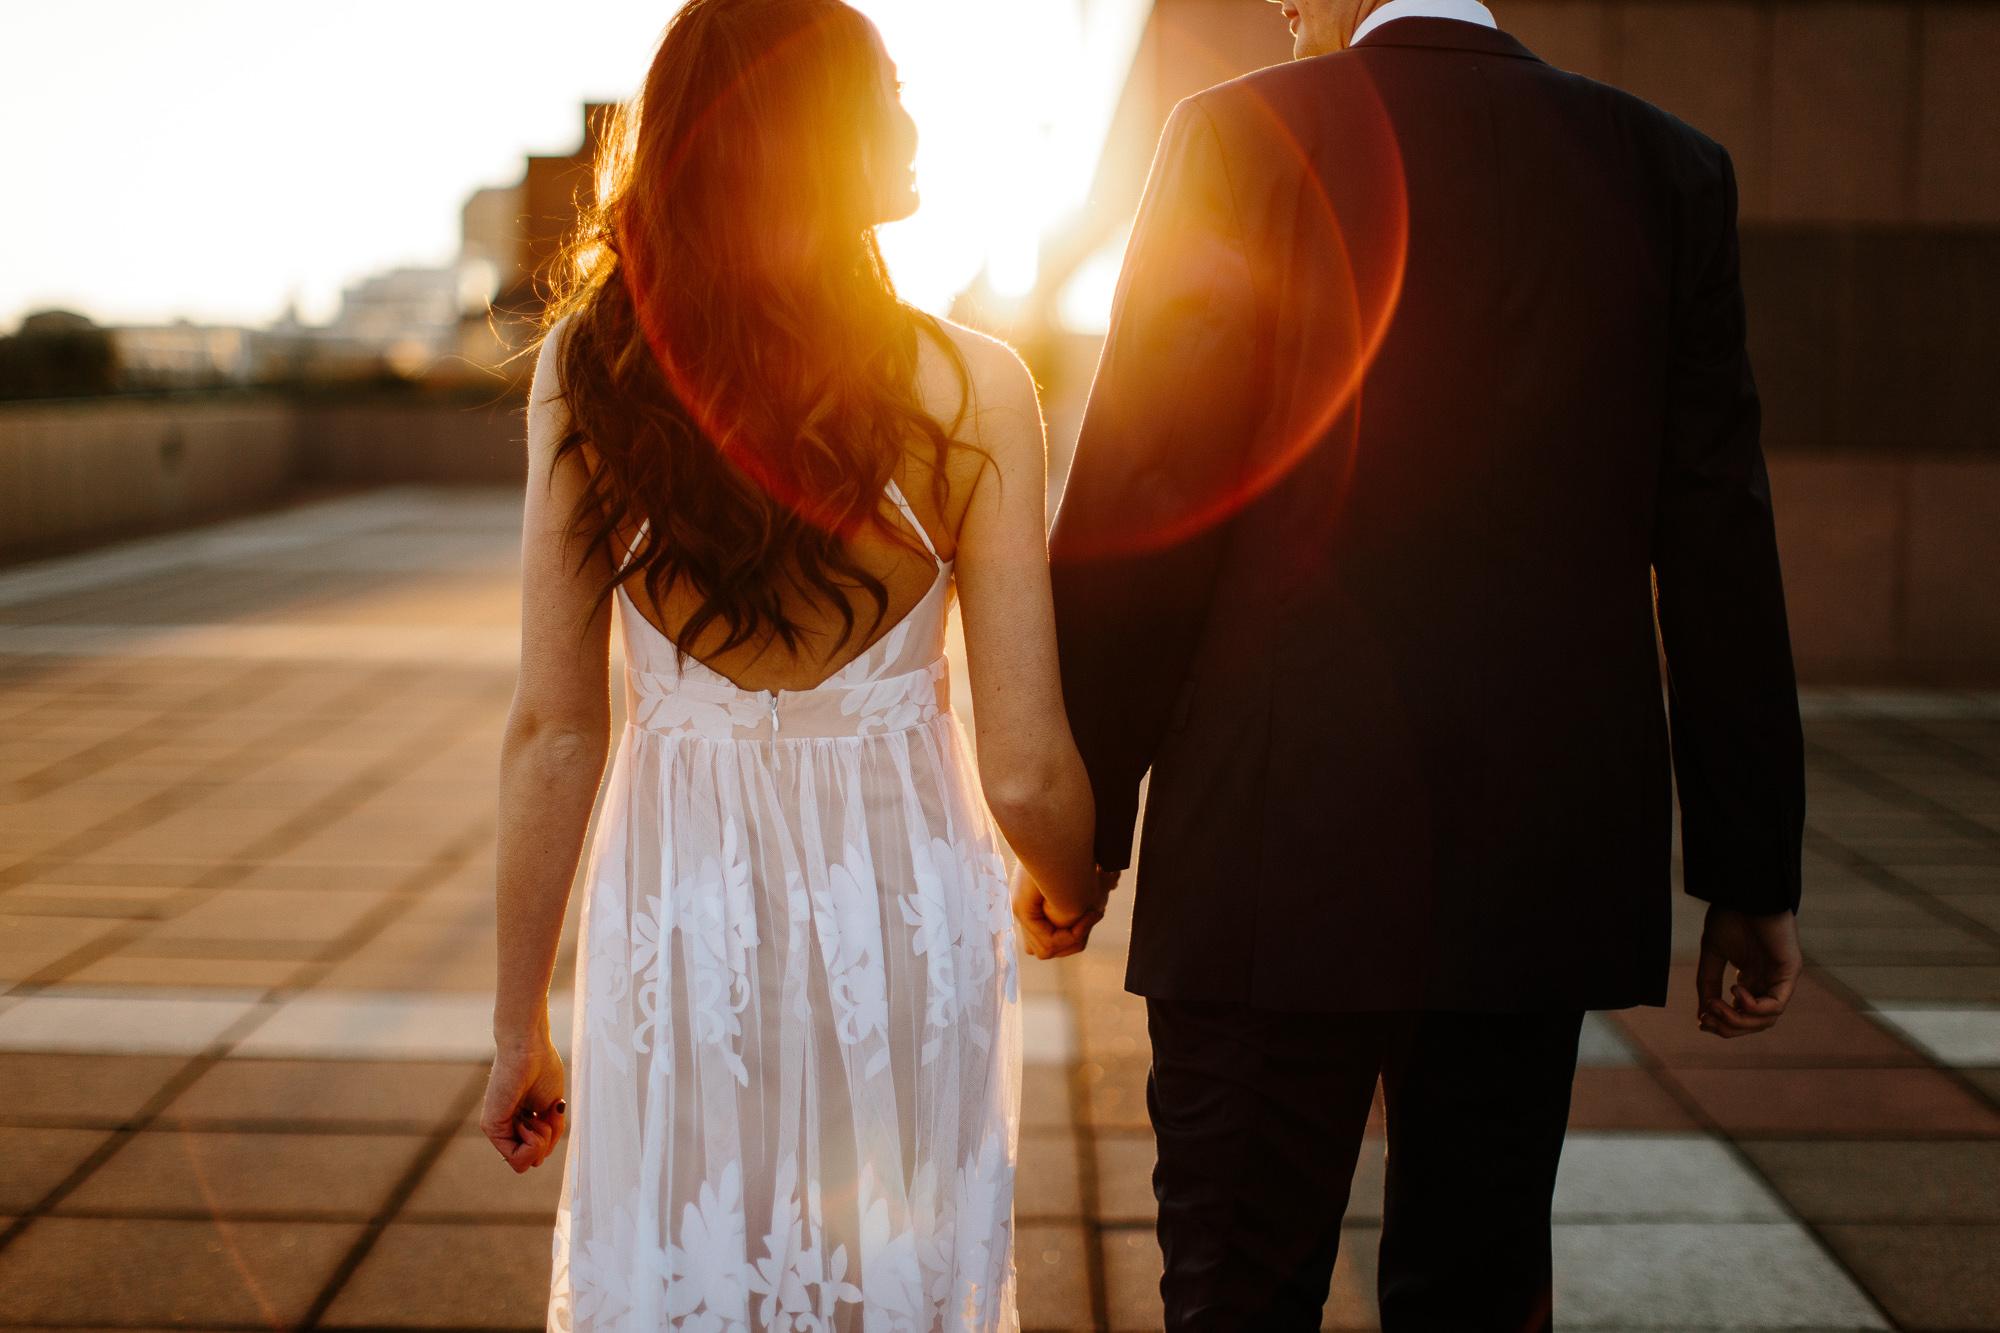 wedding-elopement-adventerous-romantic-timeless-des-moines-siouxfalls-photography-26.jpg